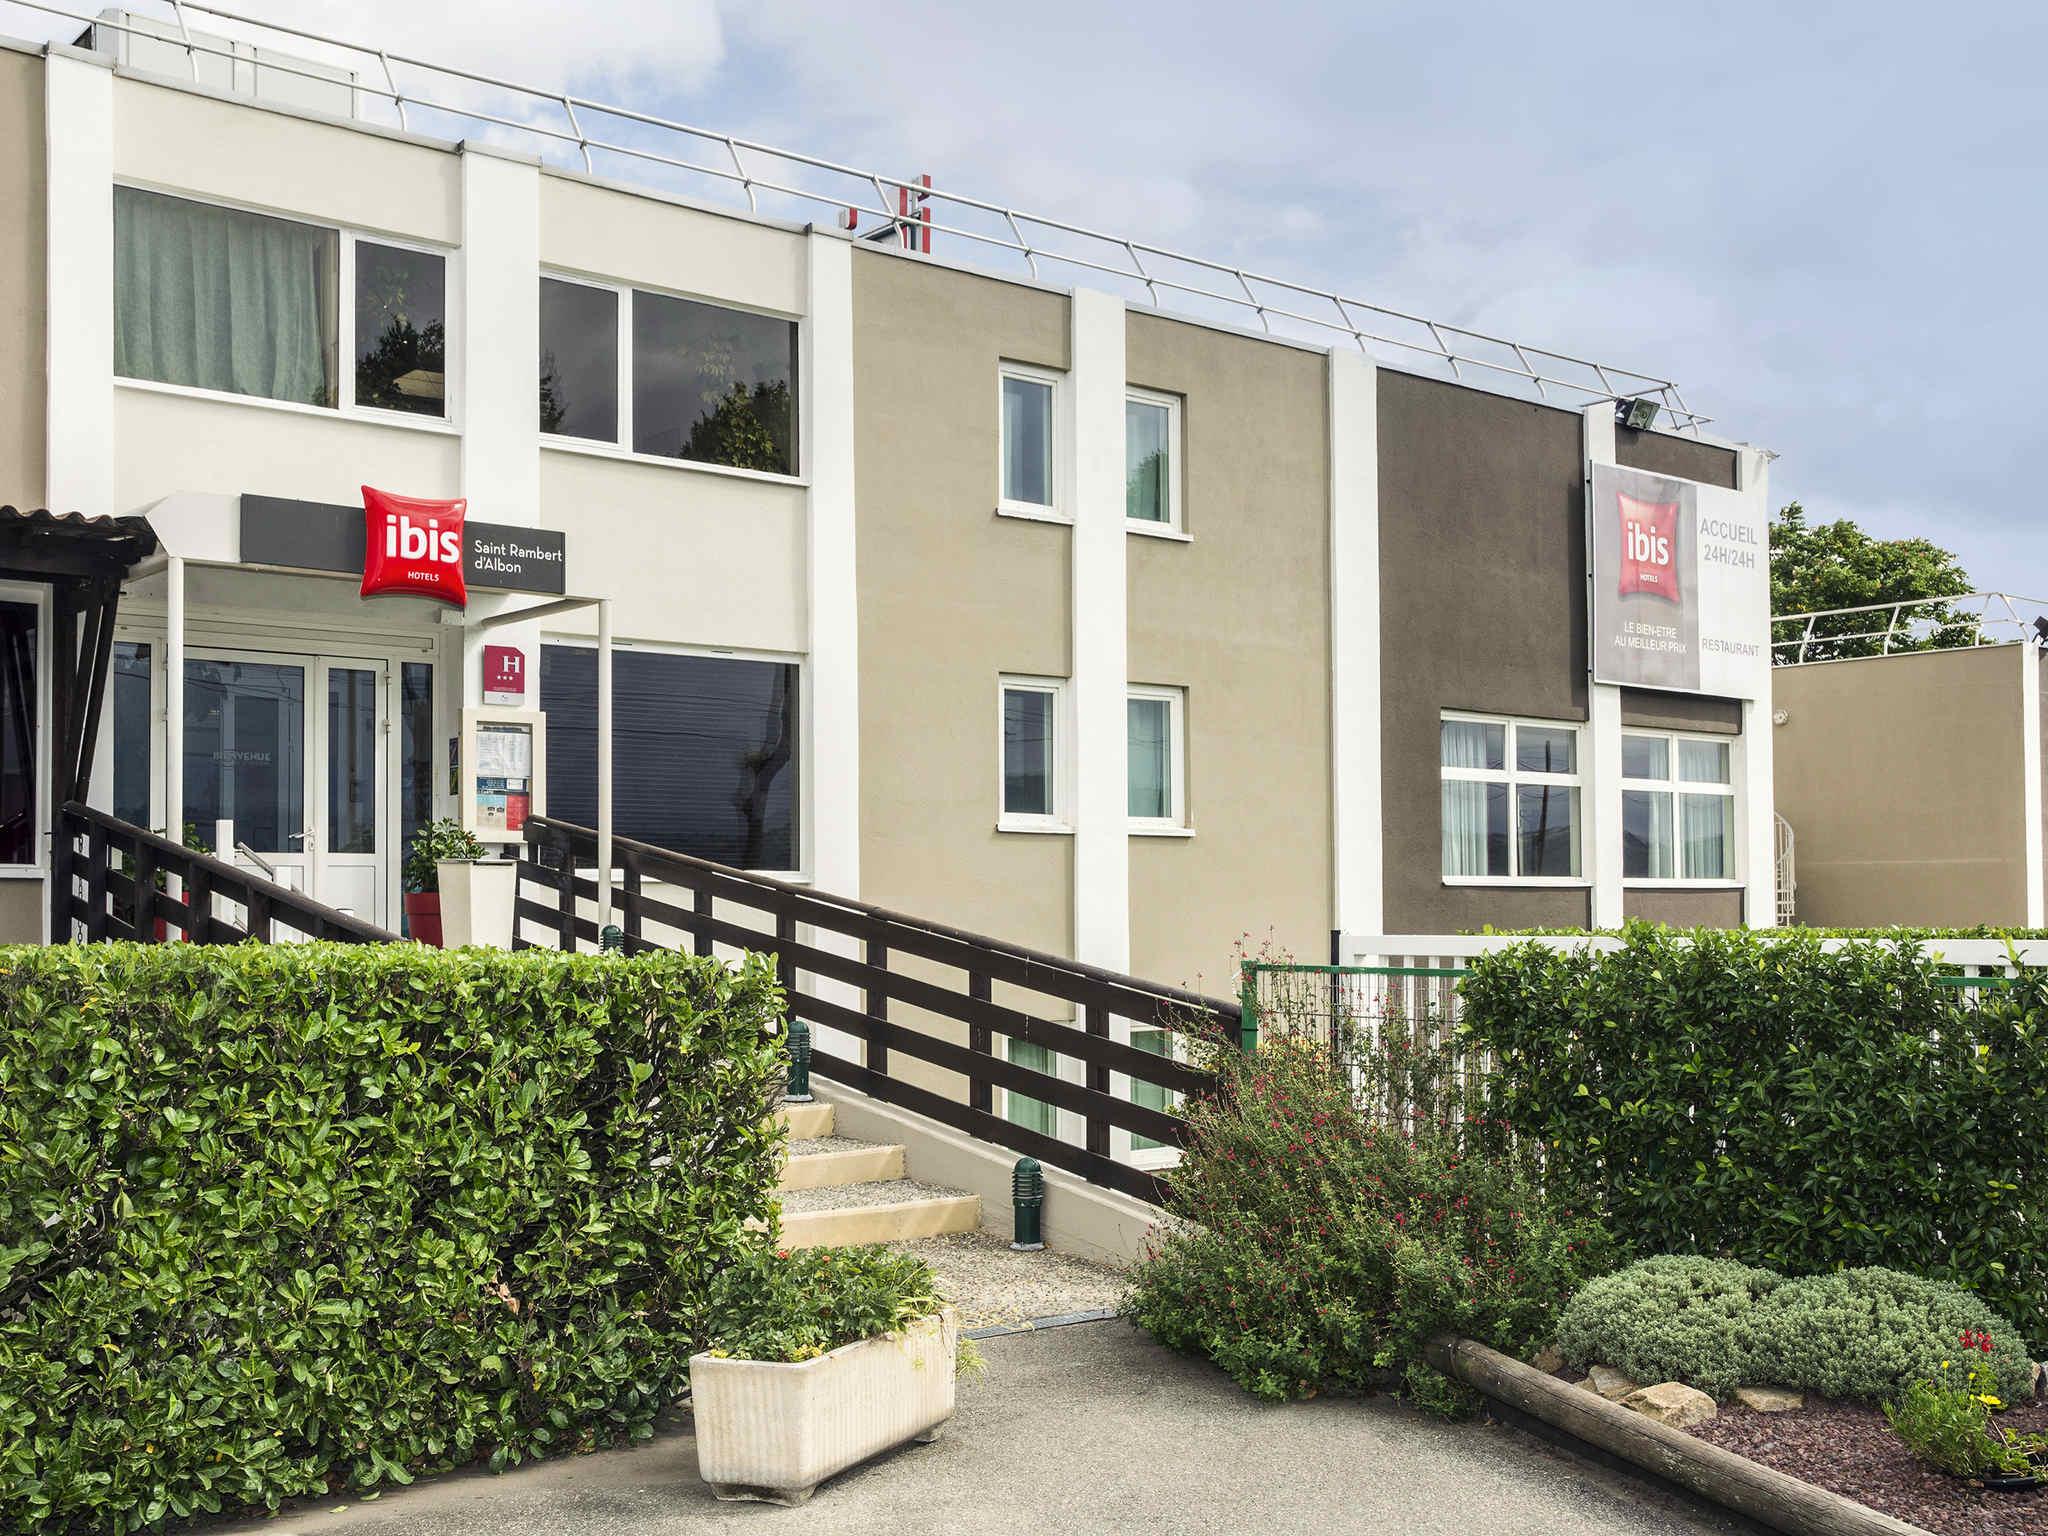 Hotel – ibis Lyon Sud Saint Rambert d'Albon